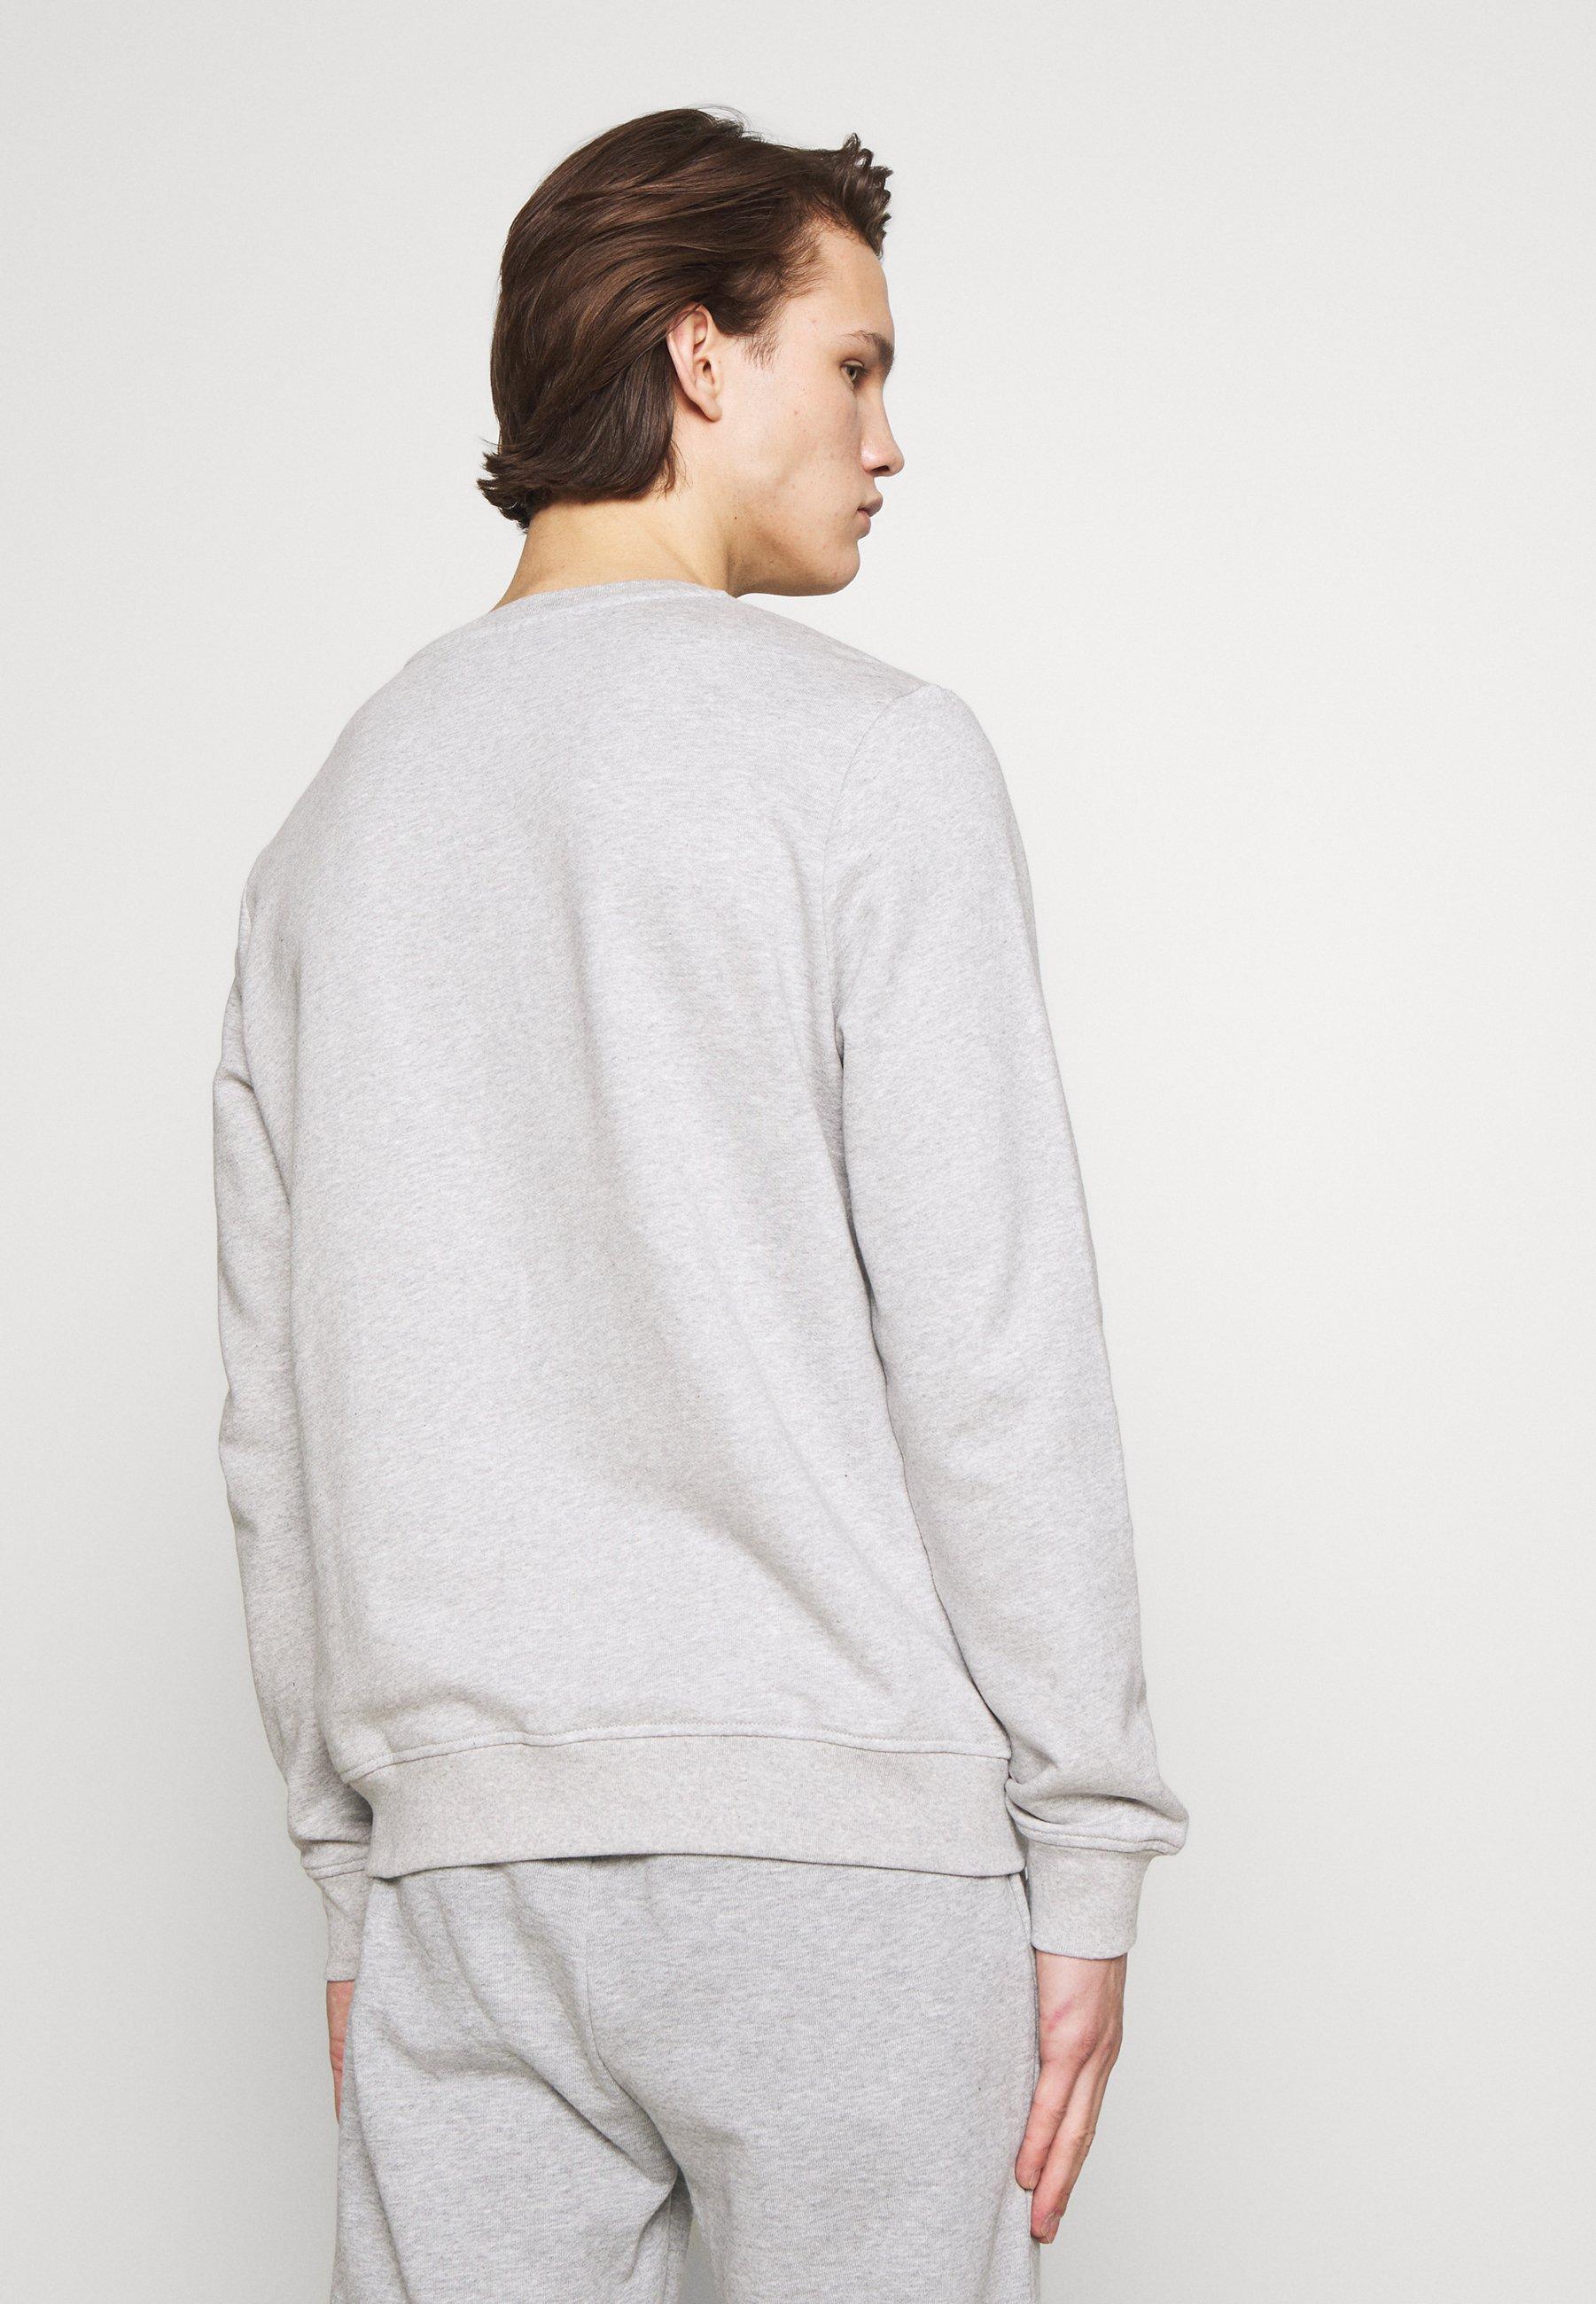 KARL LAGERFELD CREWNECK - Sweatshirt - grey